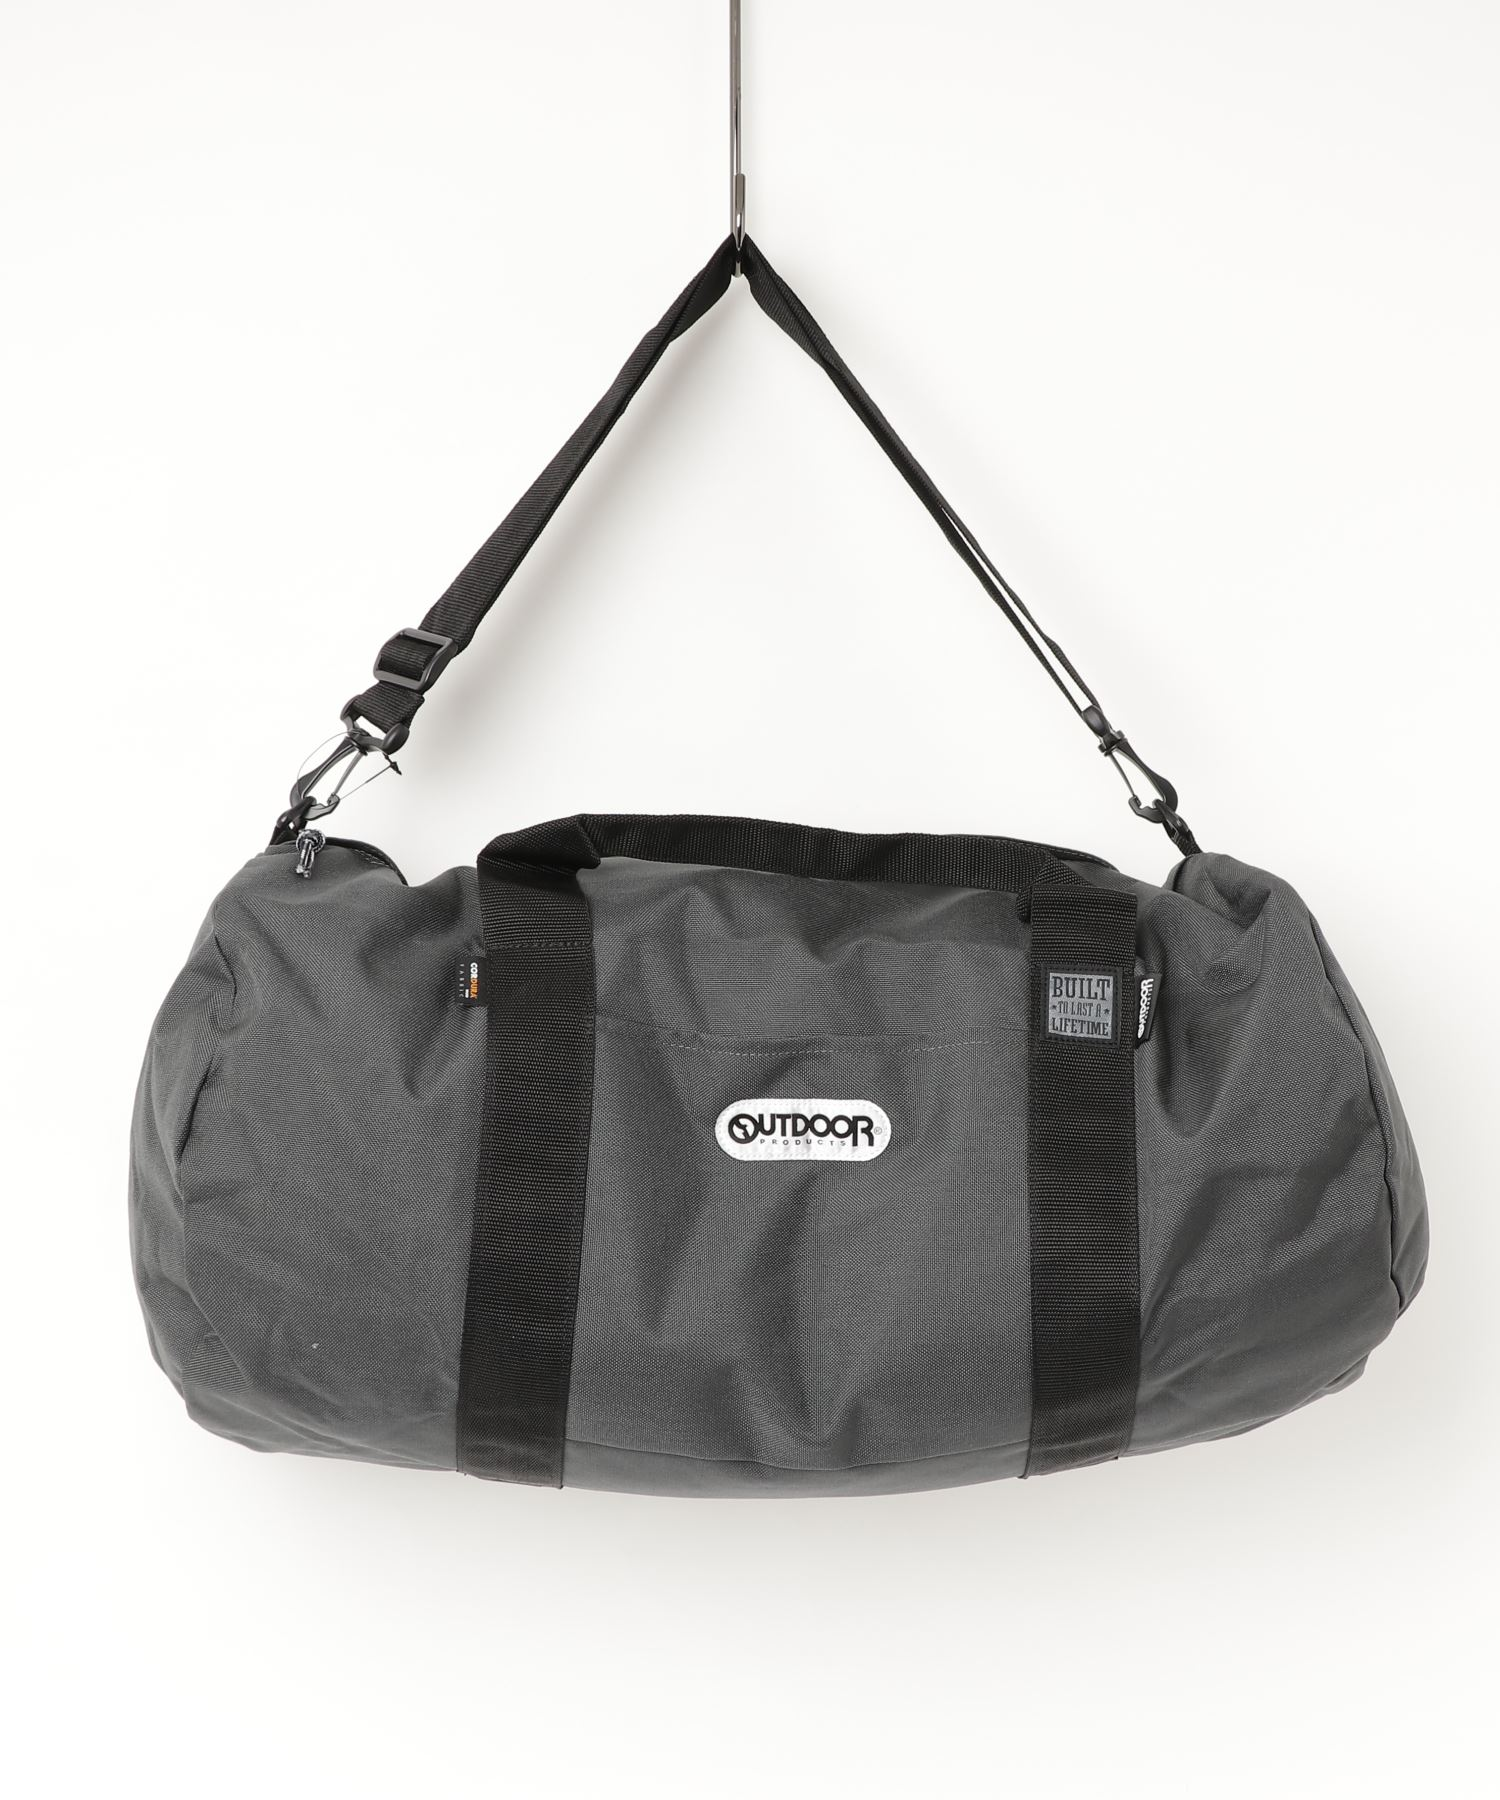 Outdoor Products アウトドアプロダクツ / ダッフルバッグ 232